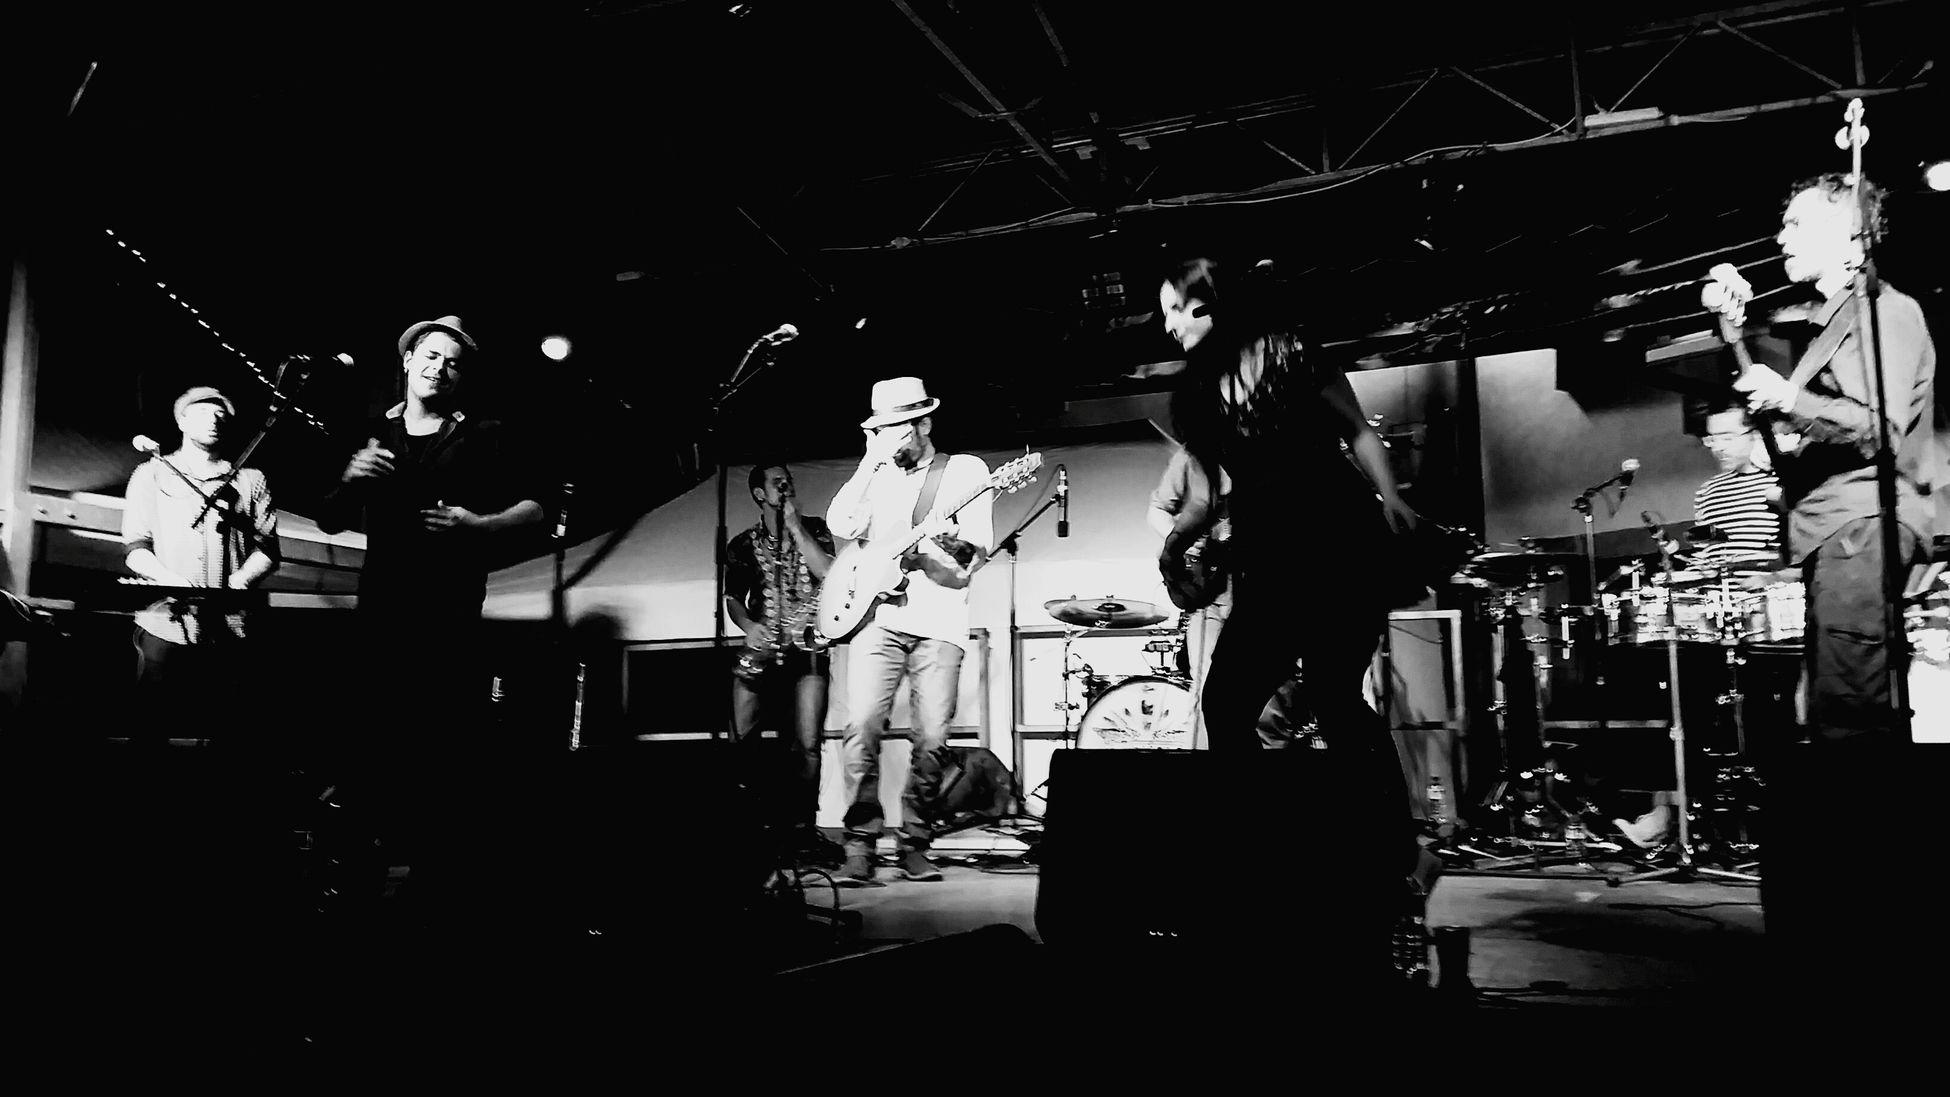 Rock Musician Bonheur Music Performance Enjoying Life Artist Concerts Hautes Alpes Mon Delire My Life ❤ Lasmala Band